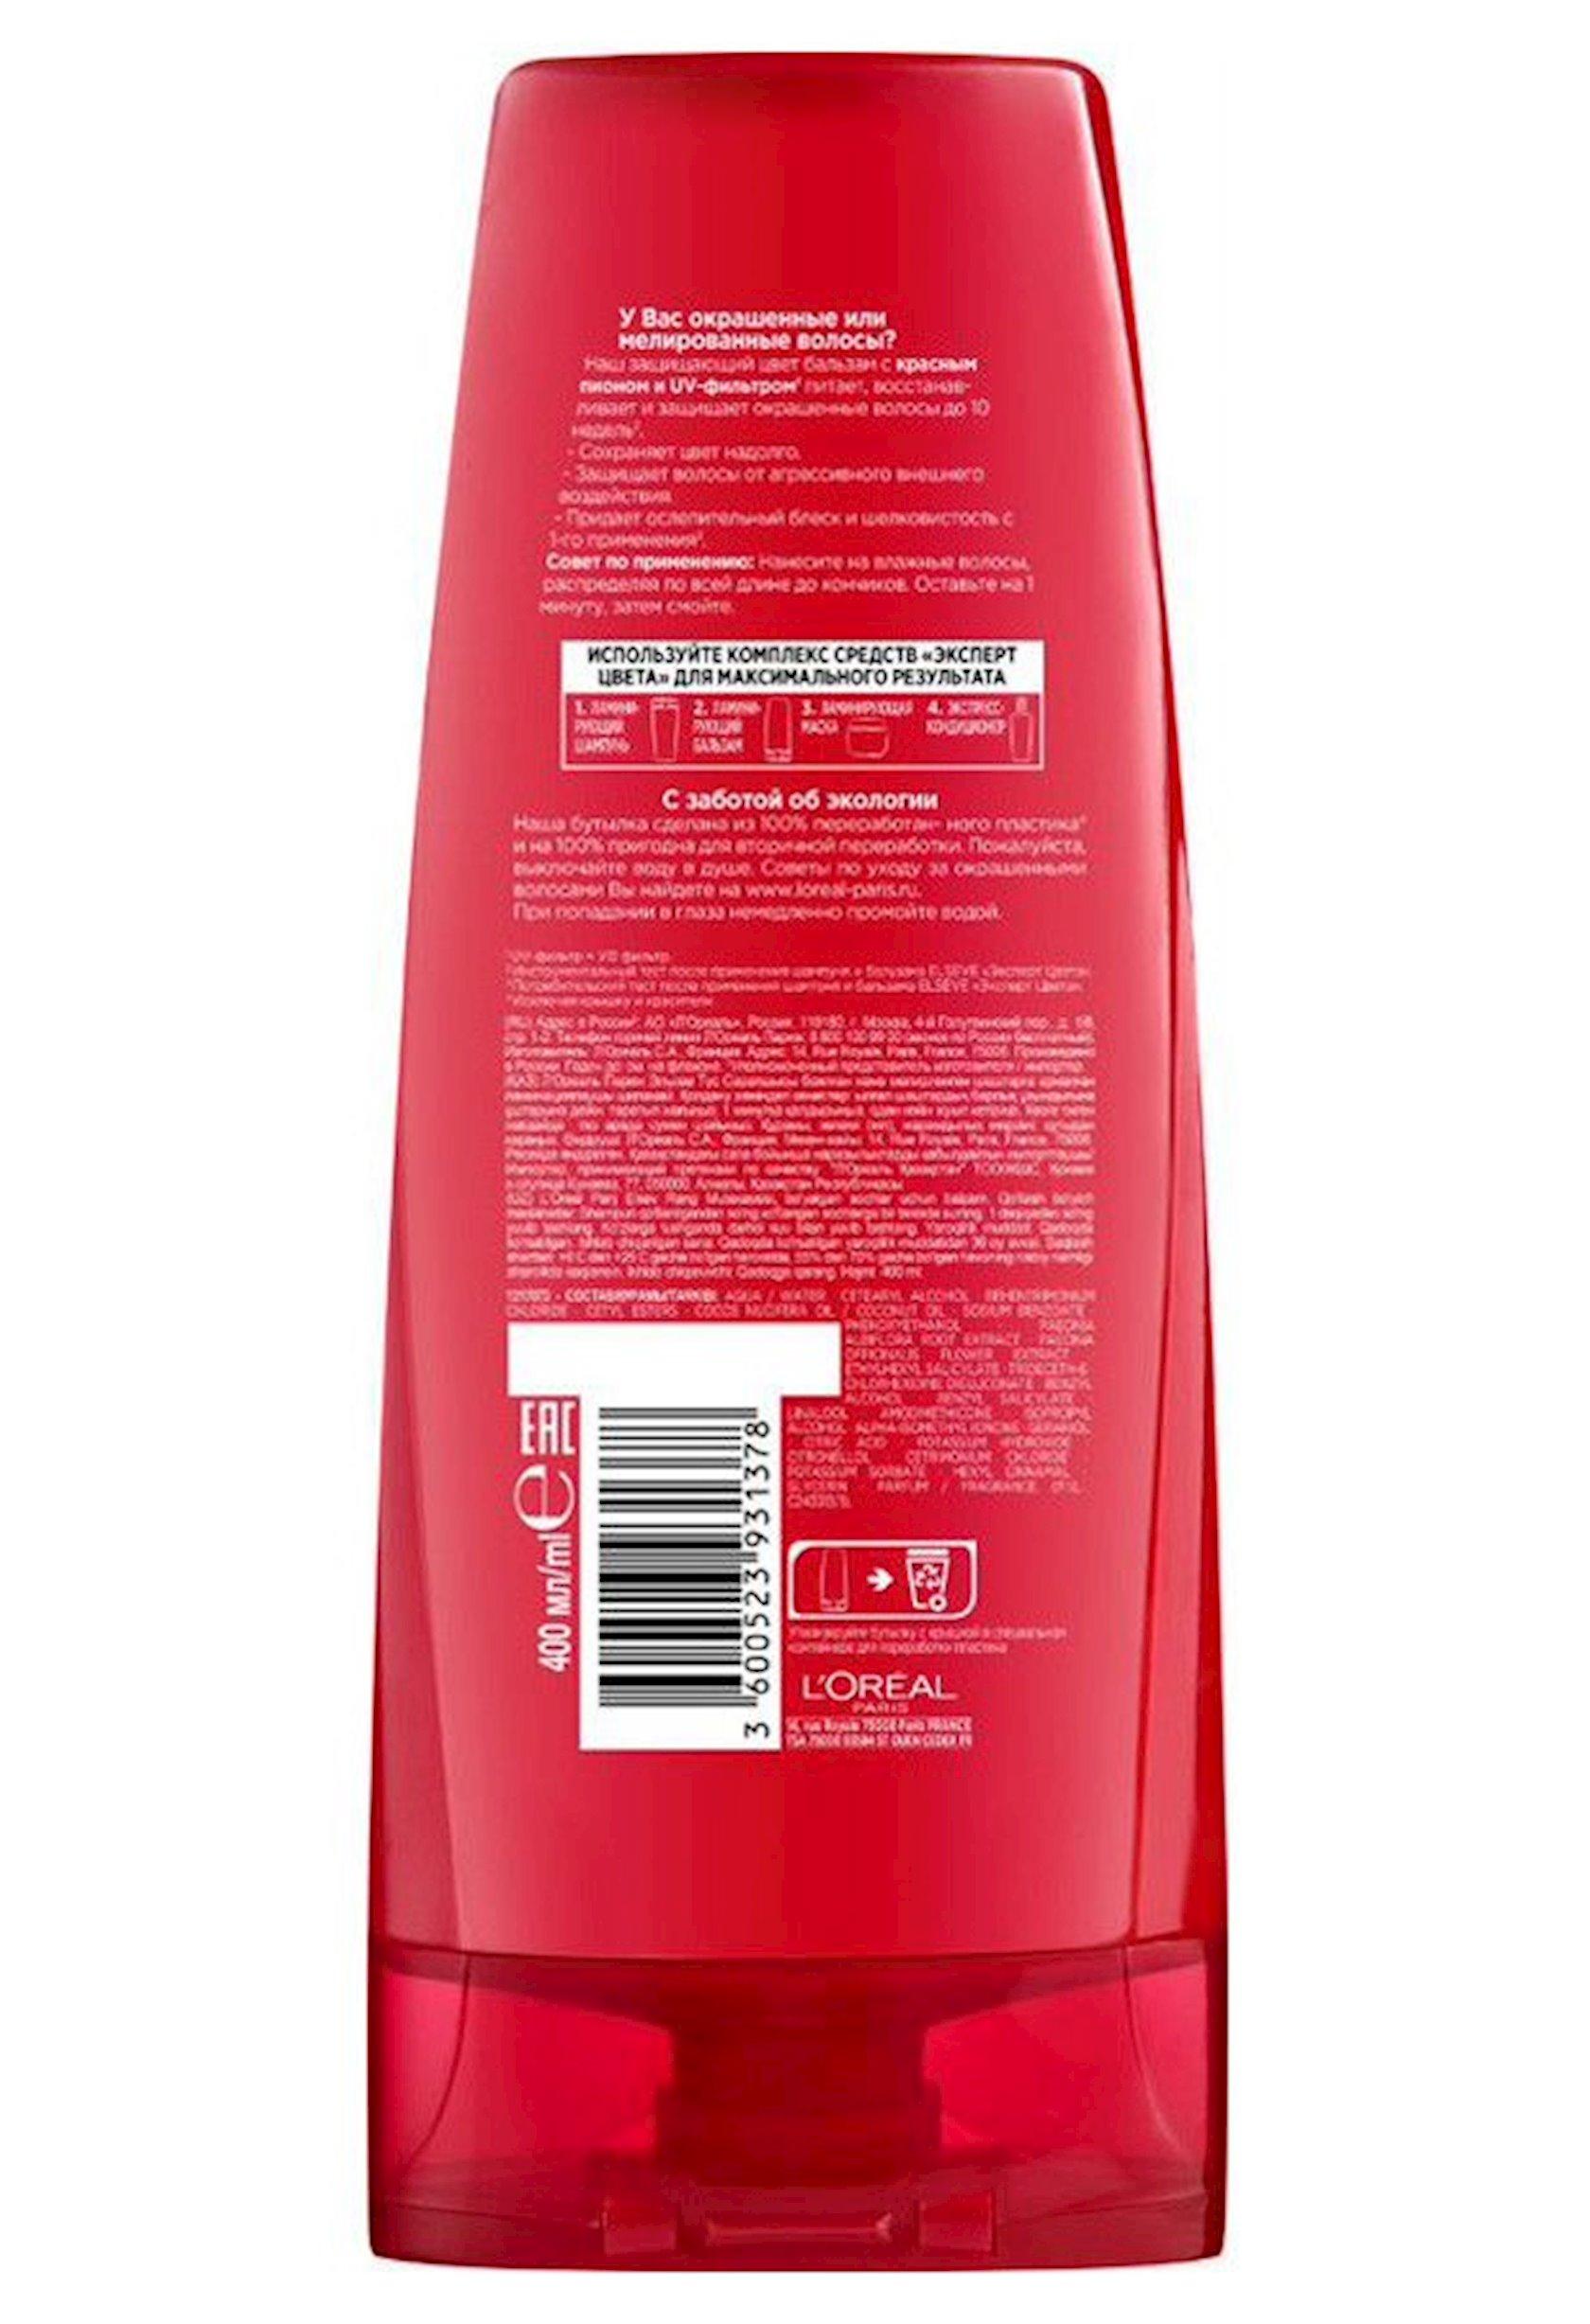 Saçlar üçün balzam L'Oréal Paris Elseve Rəng Eksperti Laminasiyaedici, 400 ml